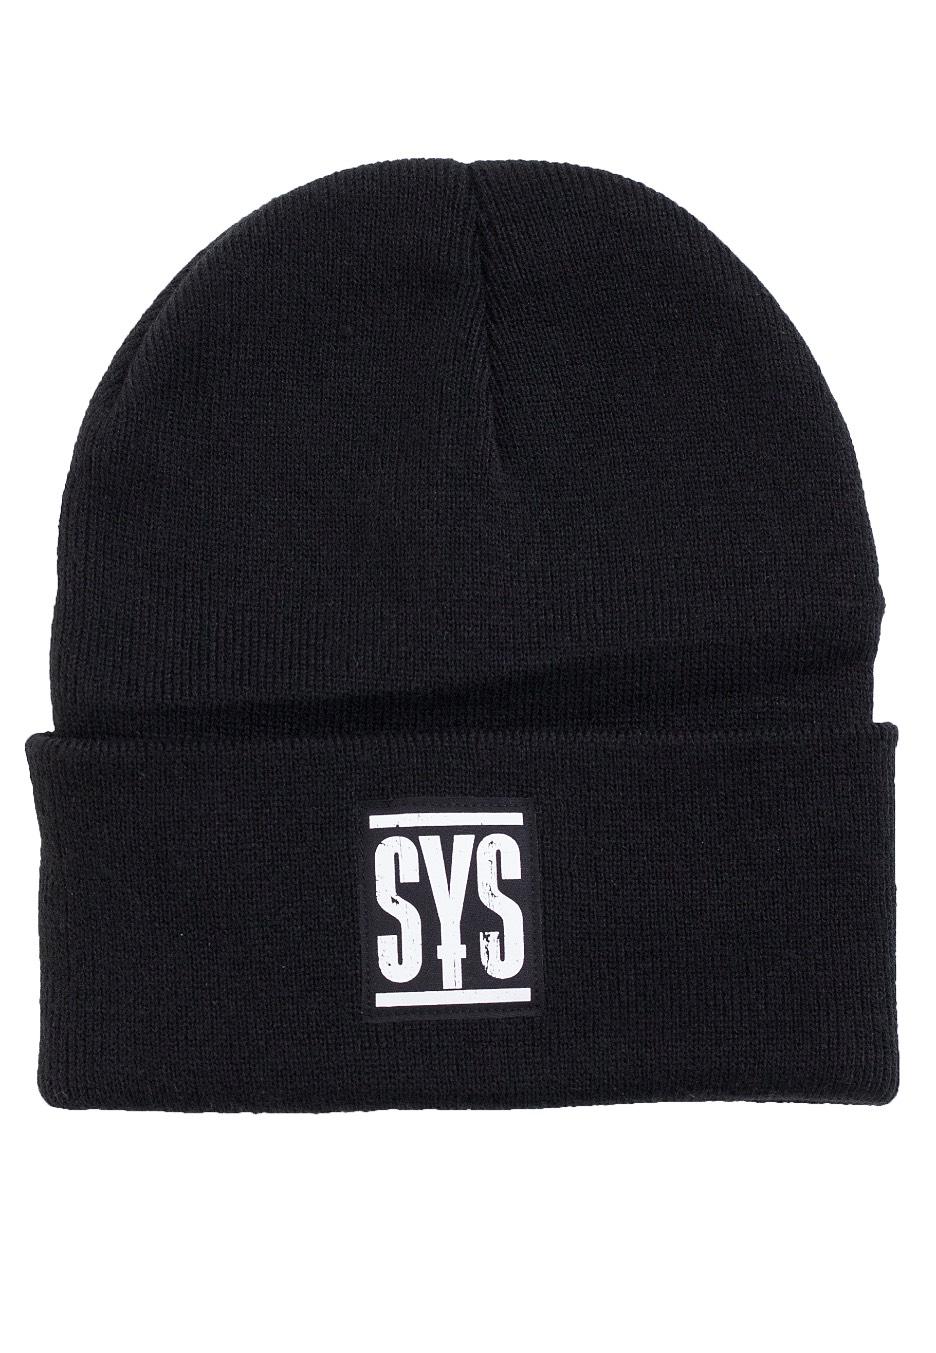 SETYOURSAILS - SYS Logo - Beanies